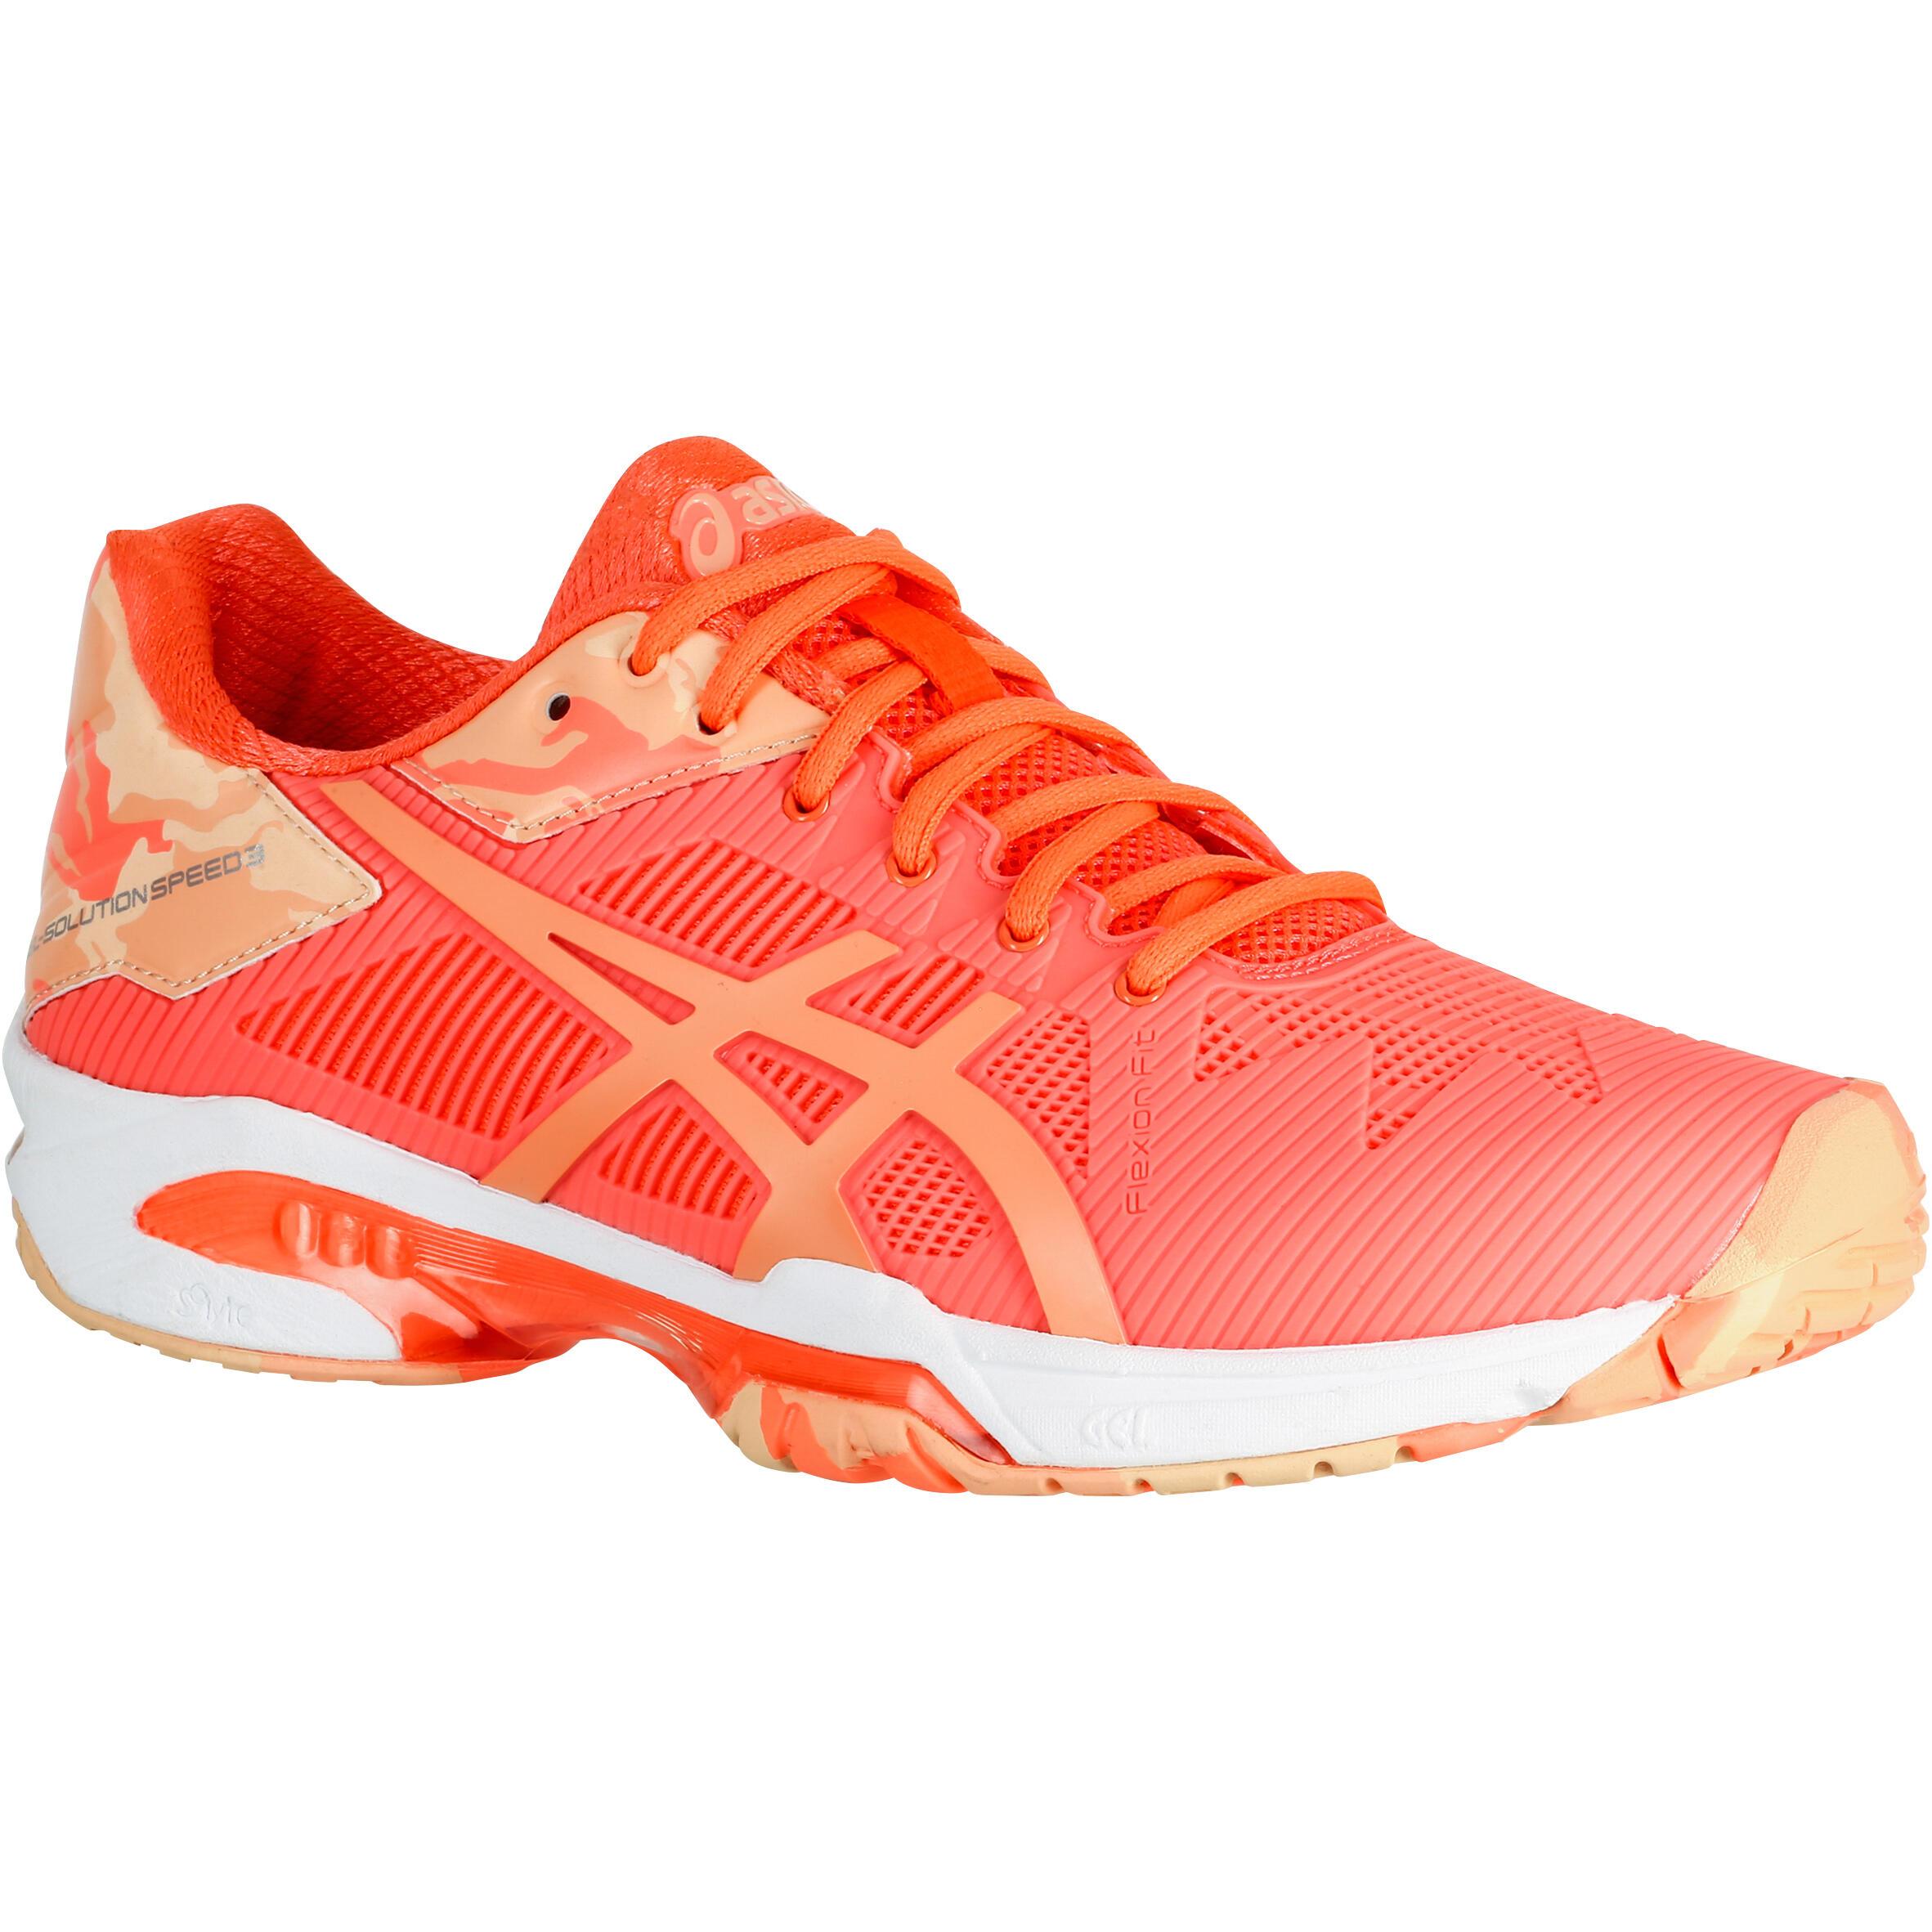 2405424 Asics Dames tennisschoenen Gel Solution Flash oranje